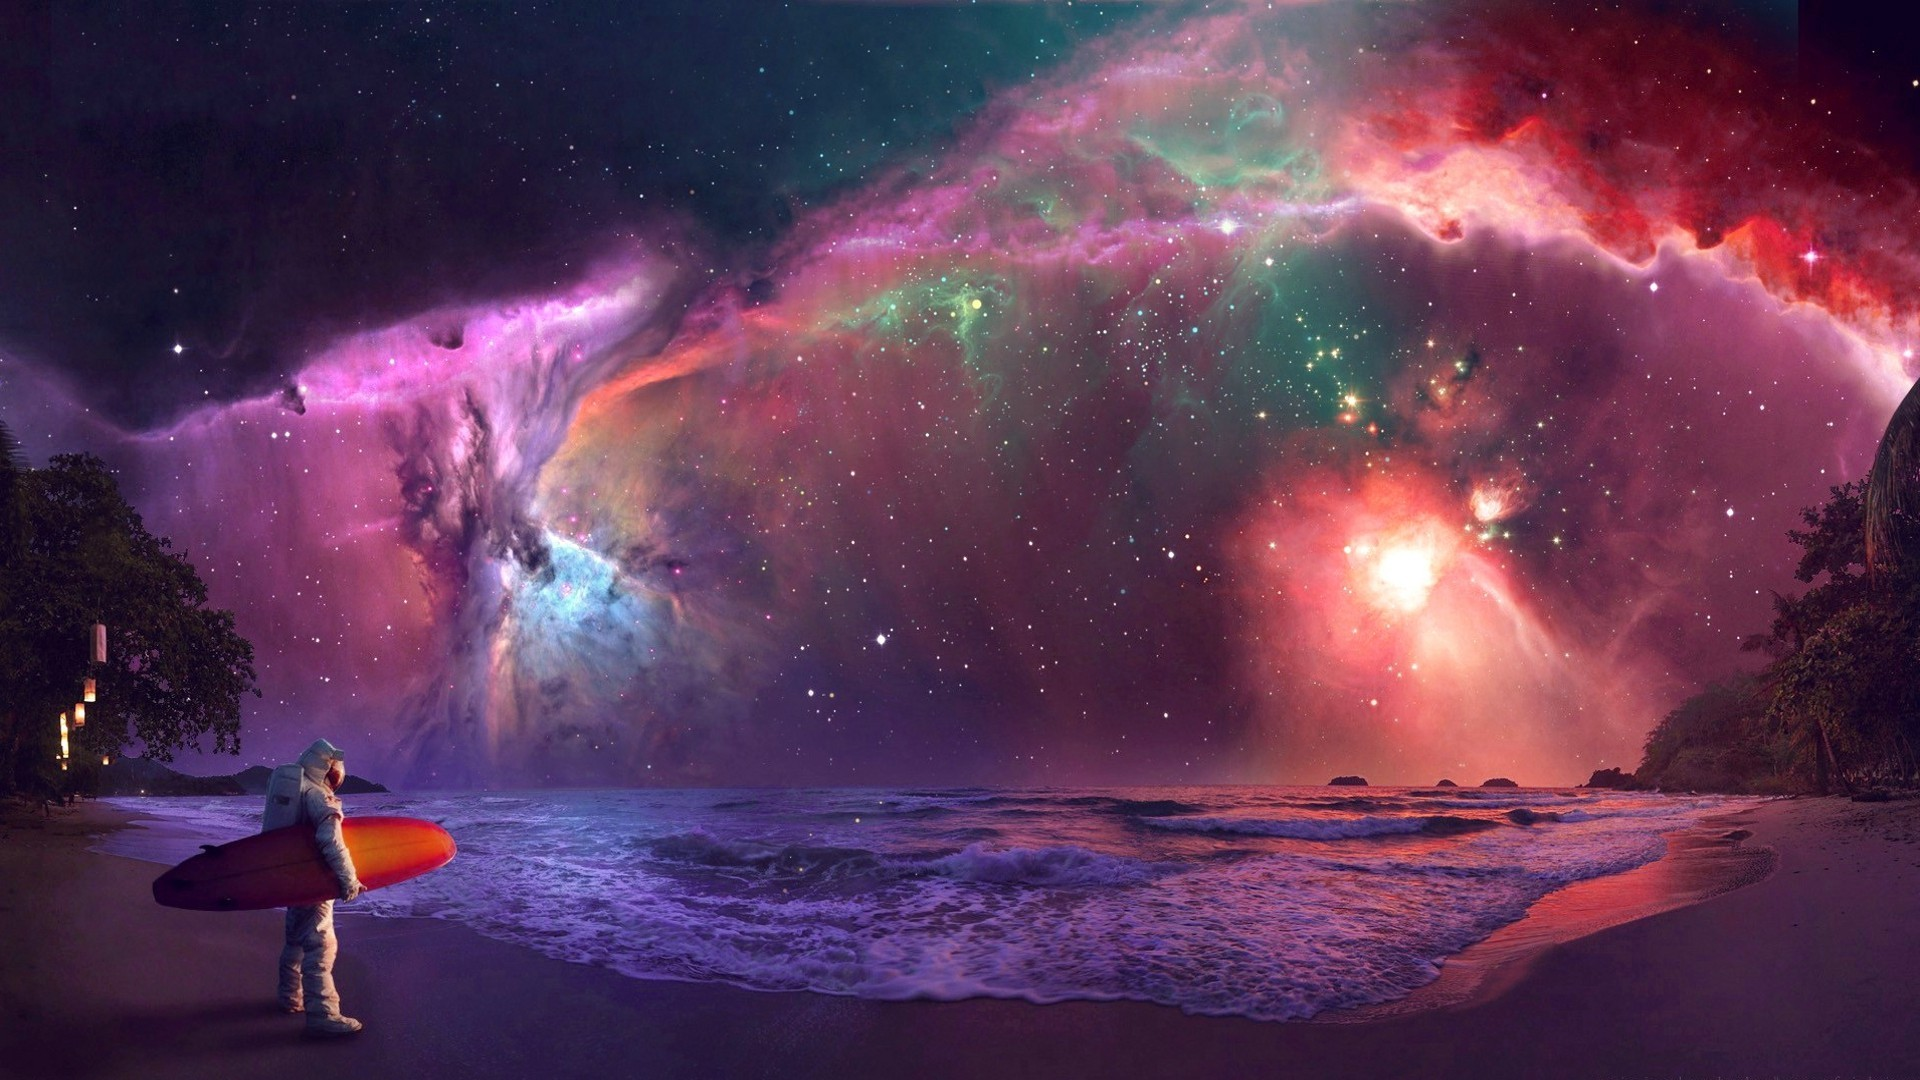 … Super Surfing HD Desktop Wallpaper. 1920×1080. Nebula Tag – Nebula  Beach Space Colorful Surfer Ocean Wonderful Great Waves Beaches Amazing  Paradise …